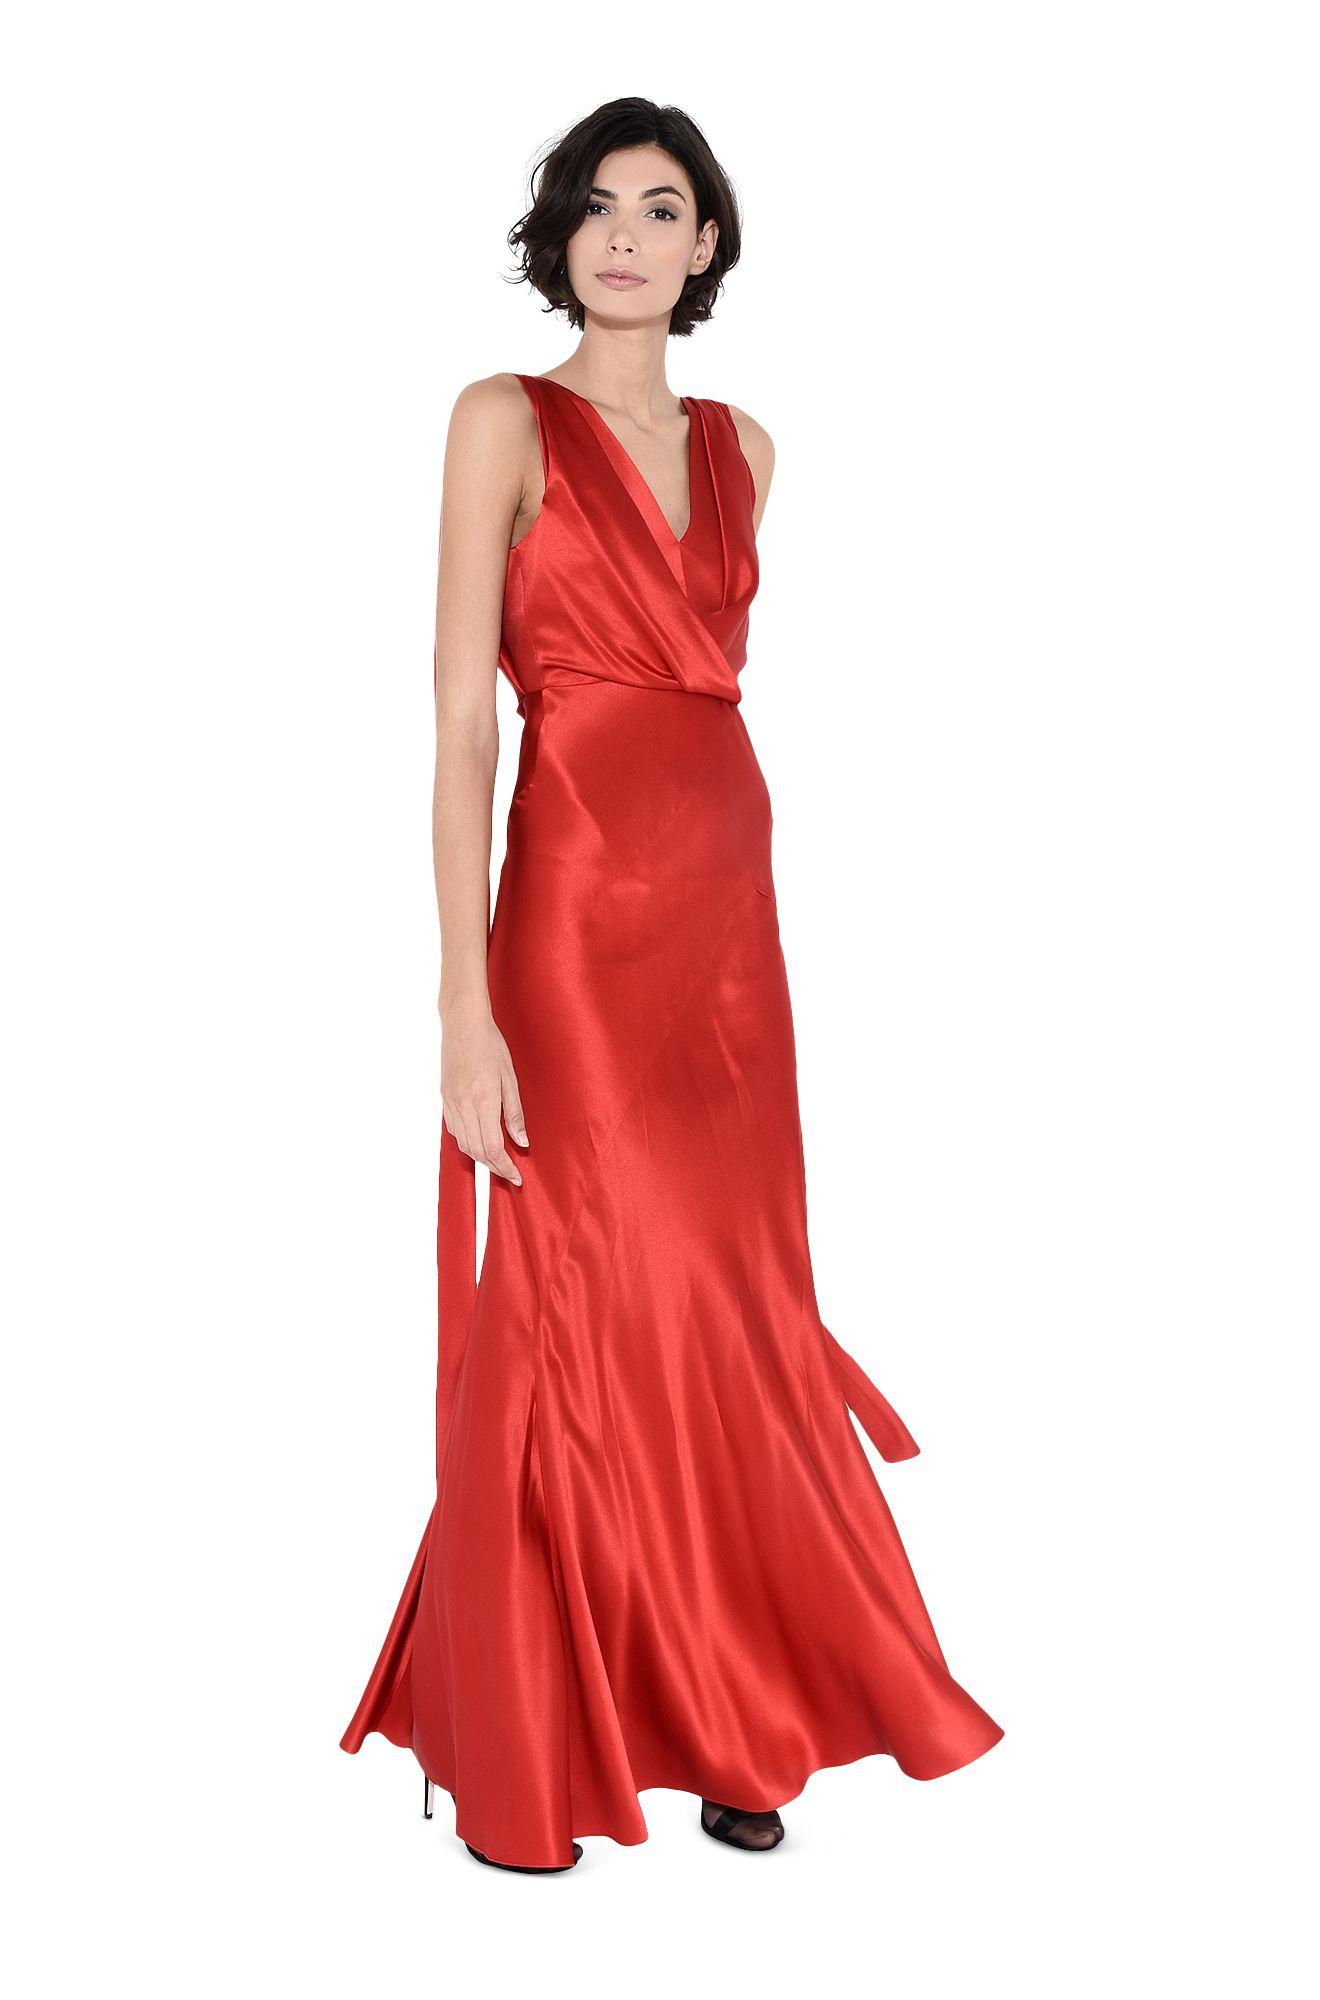 DIVA RED DRESS